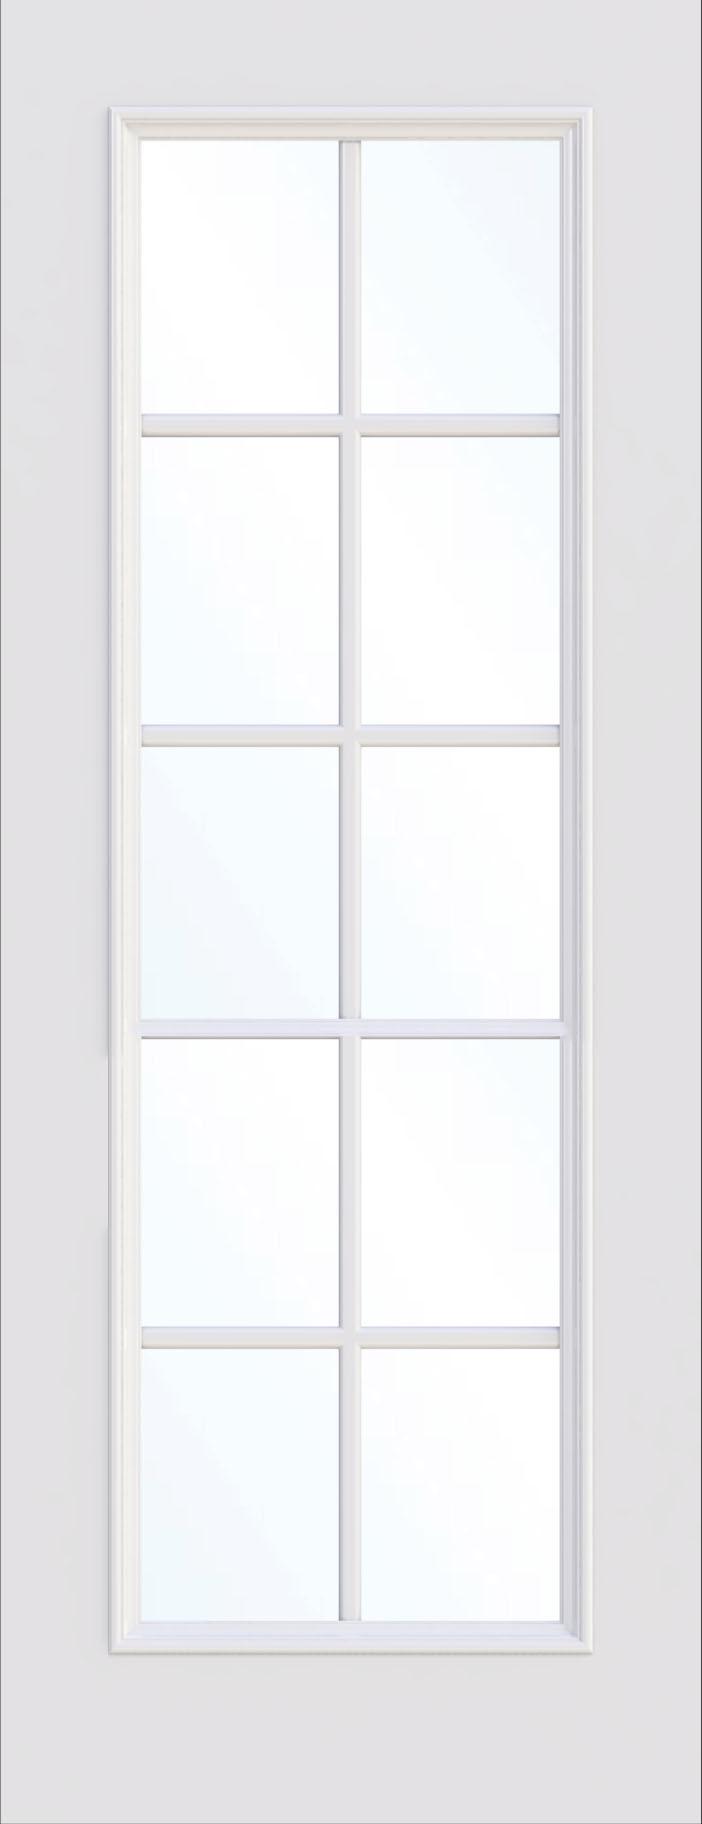 Glasgow Single Glass Fire Door